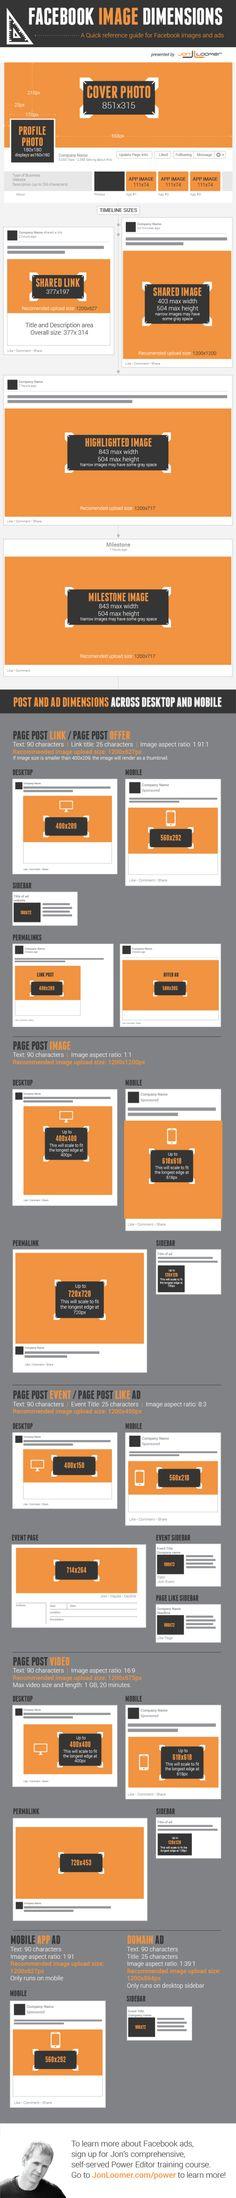 40 best Infographies Facebook images on Pinterest Digital - nist 800 53 controls spreadsheet